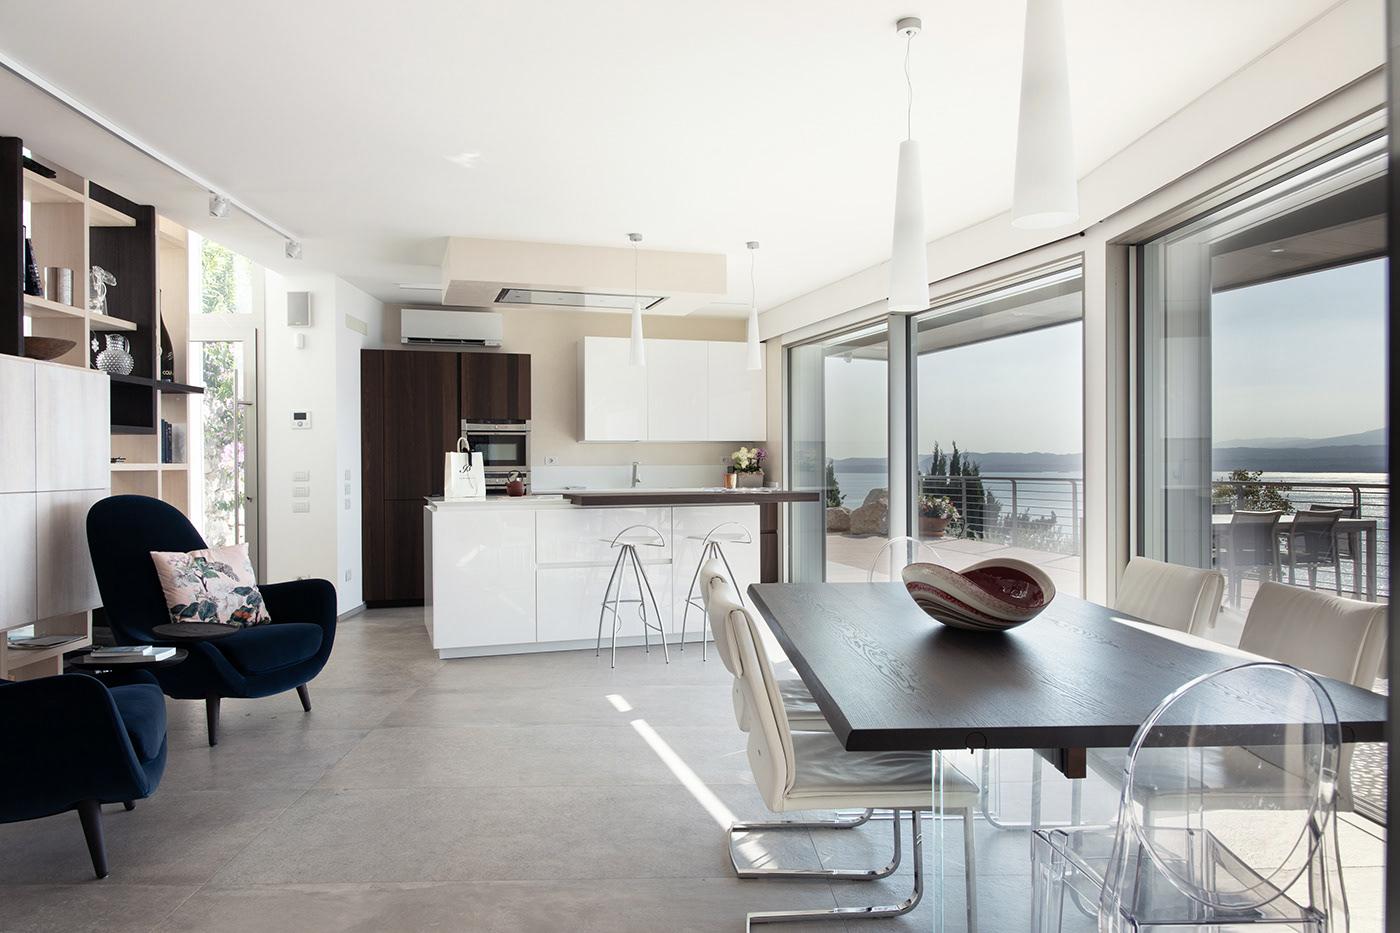 architecture contemporary design Interior Italy luxury minimal modern Pool real estate